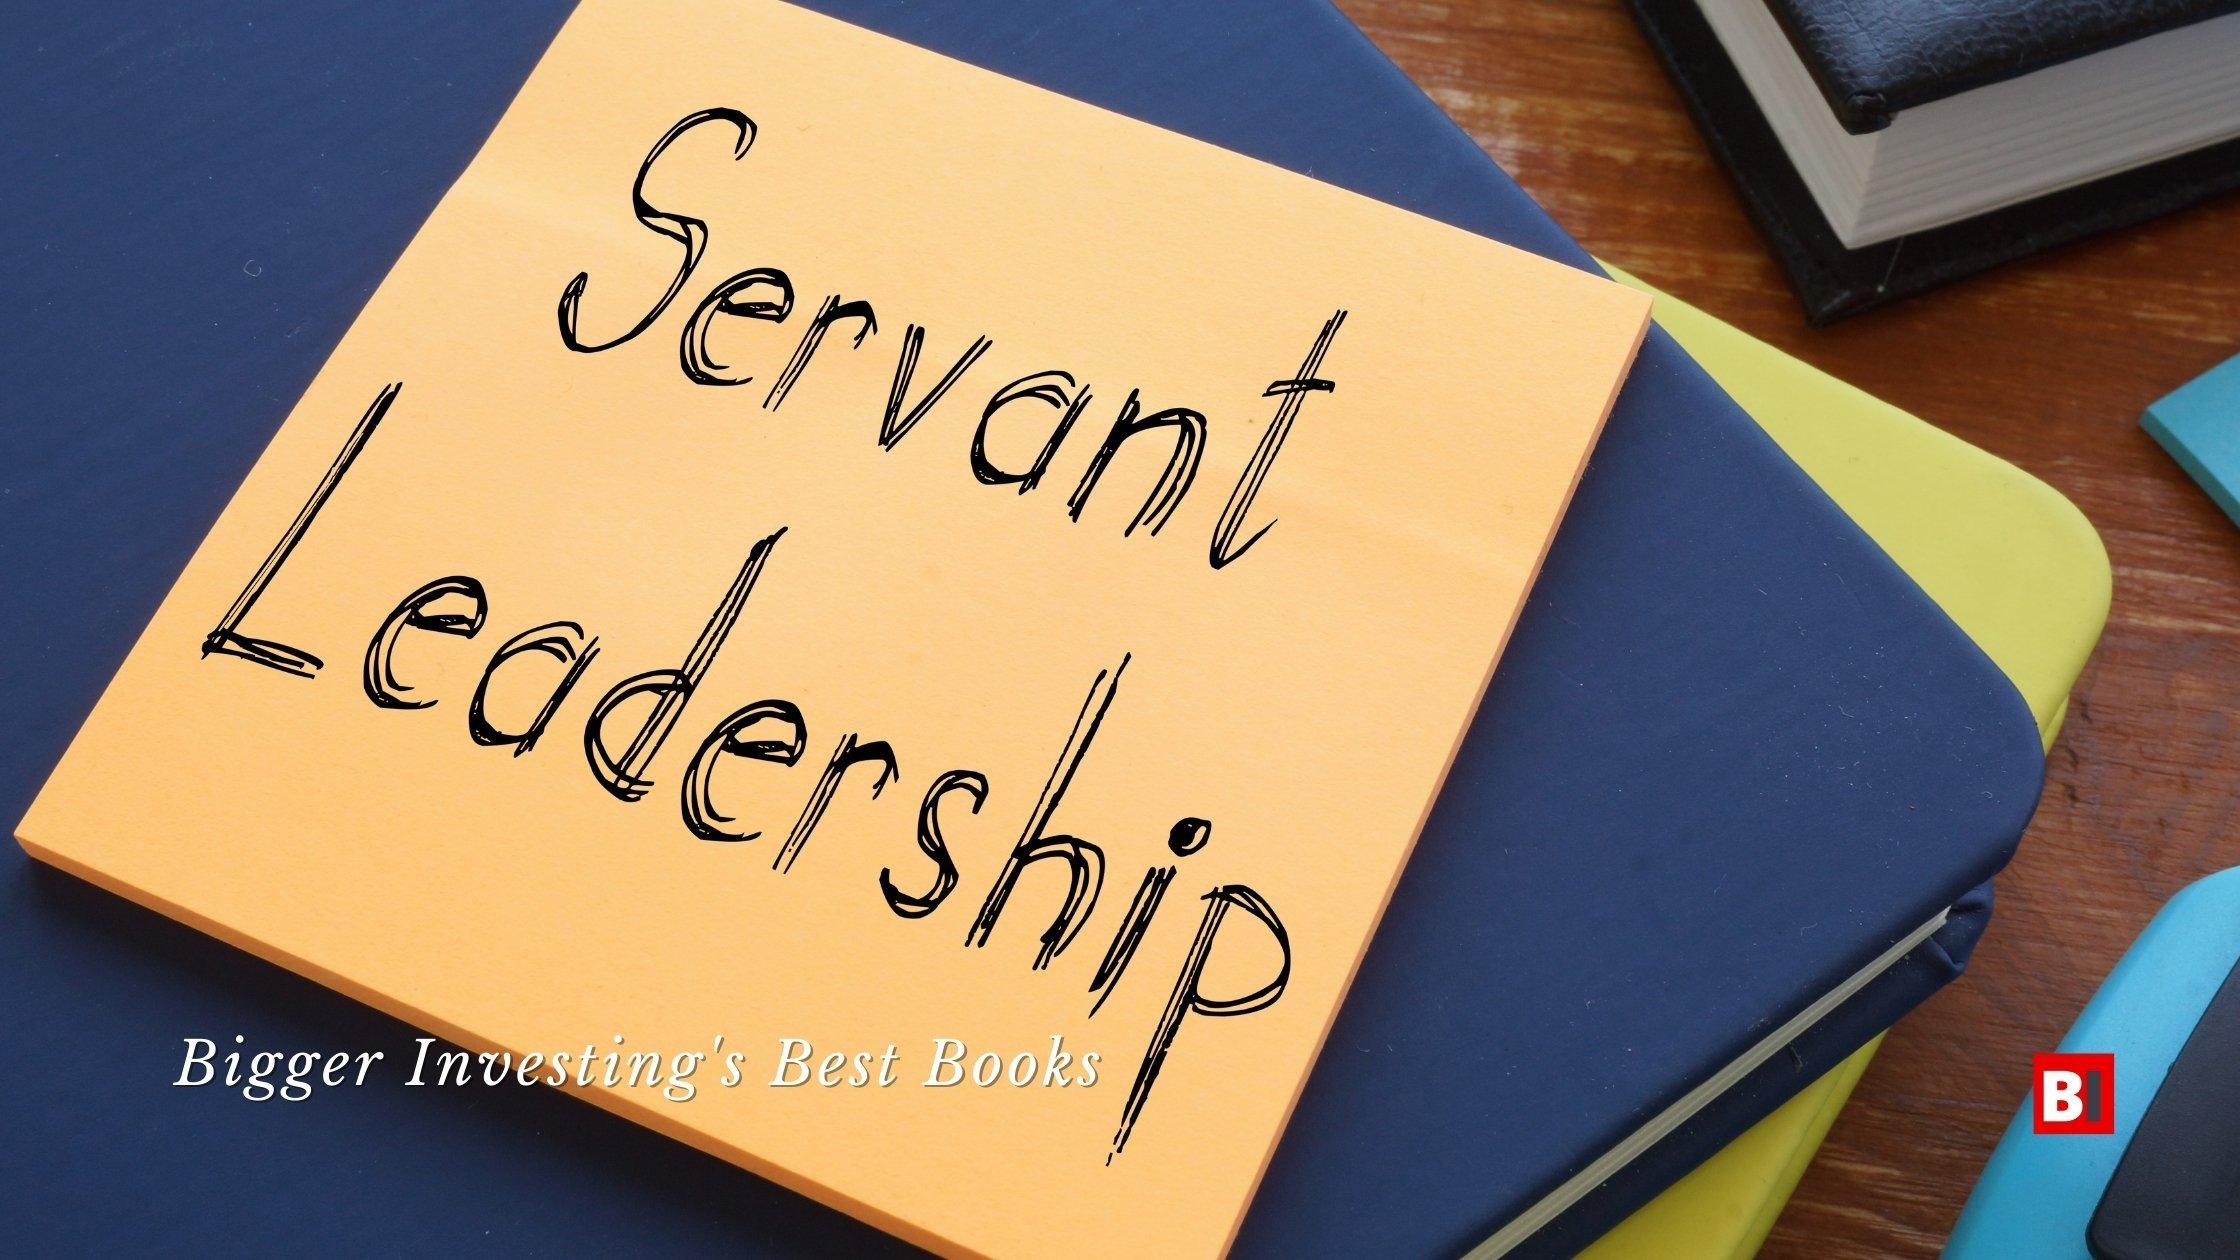 Best Books on Servant Leadership